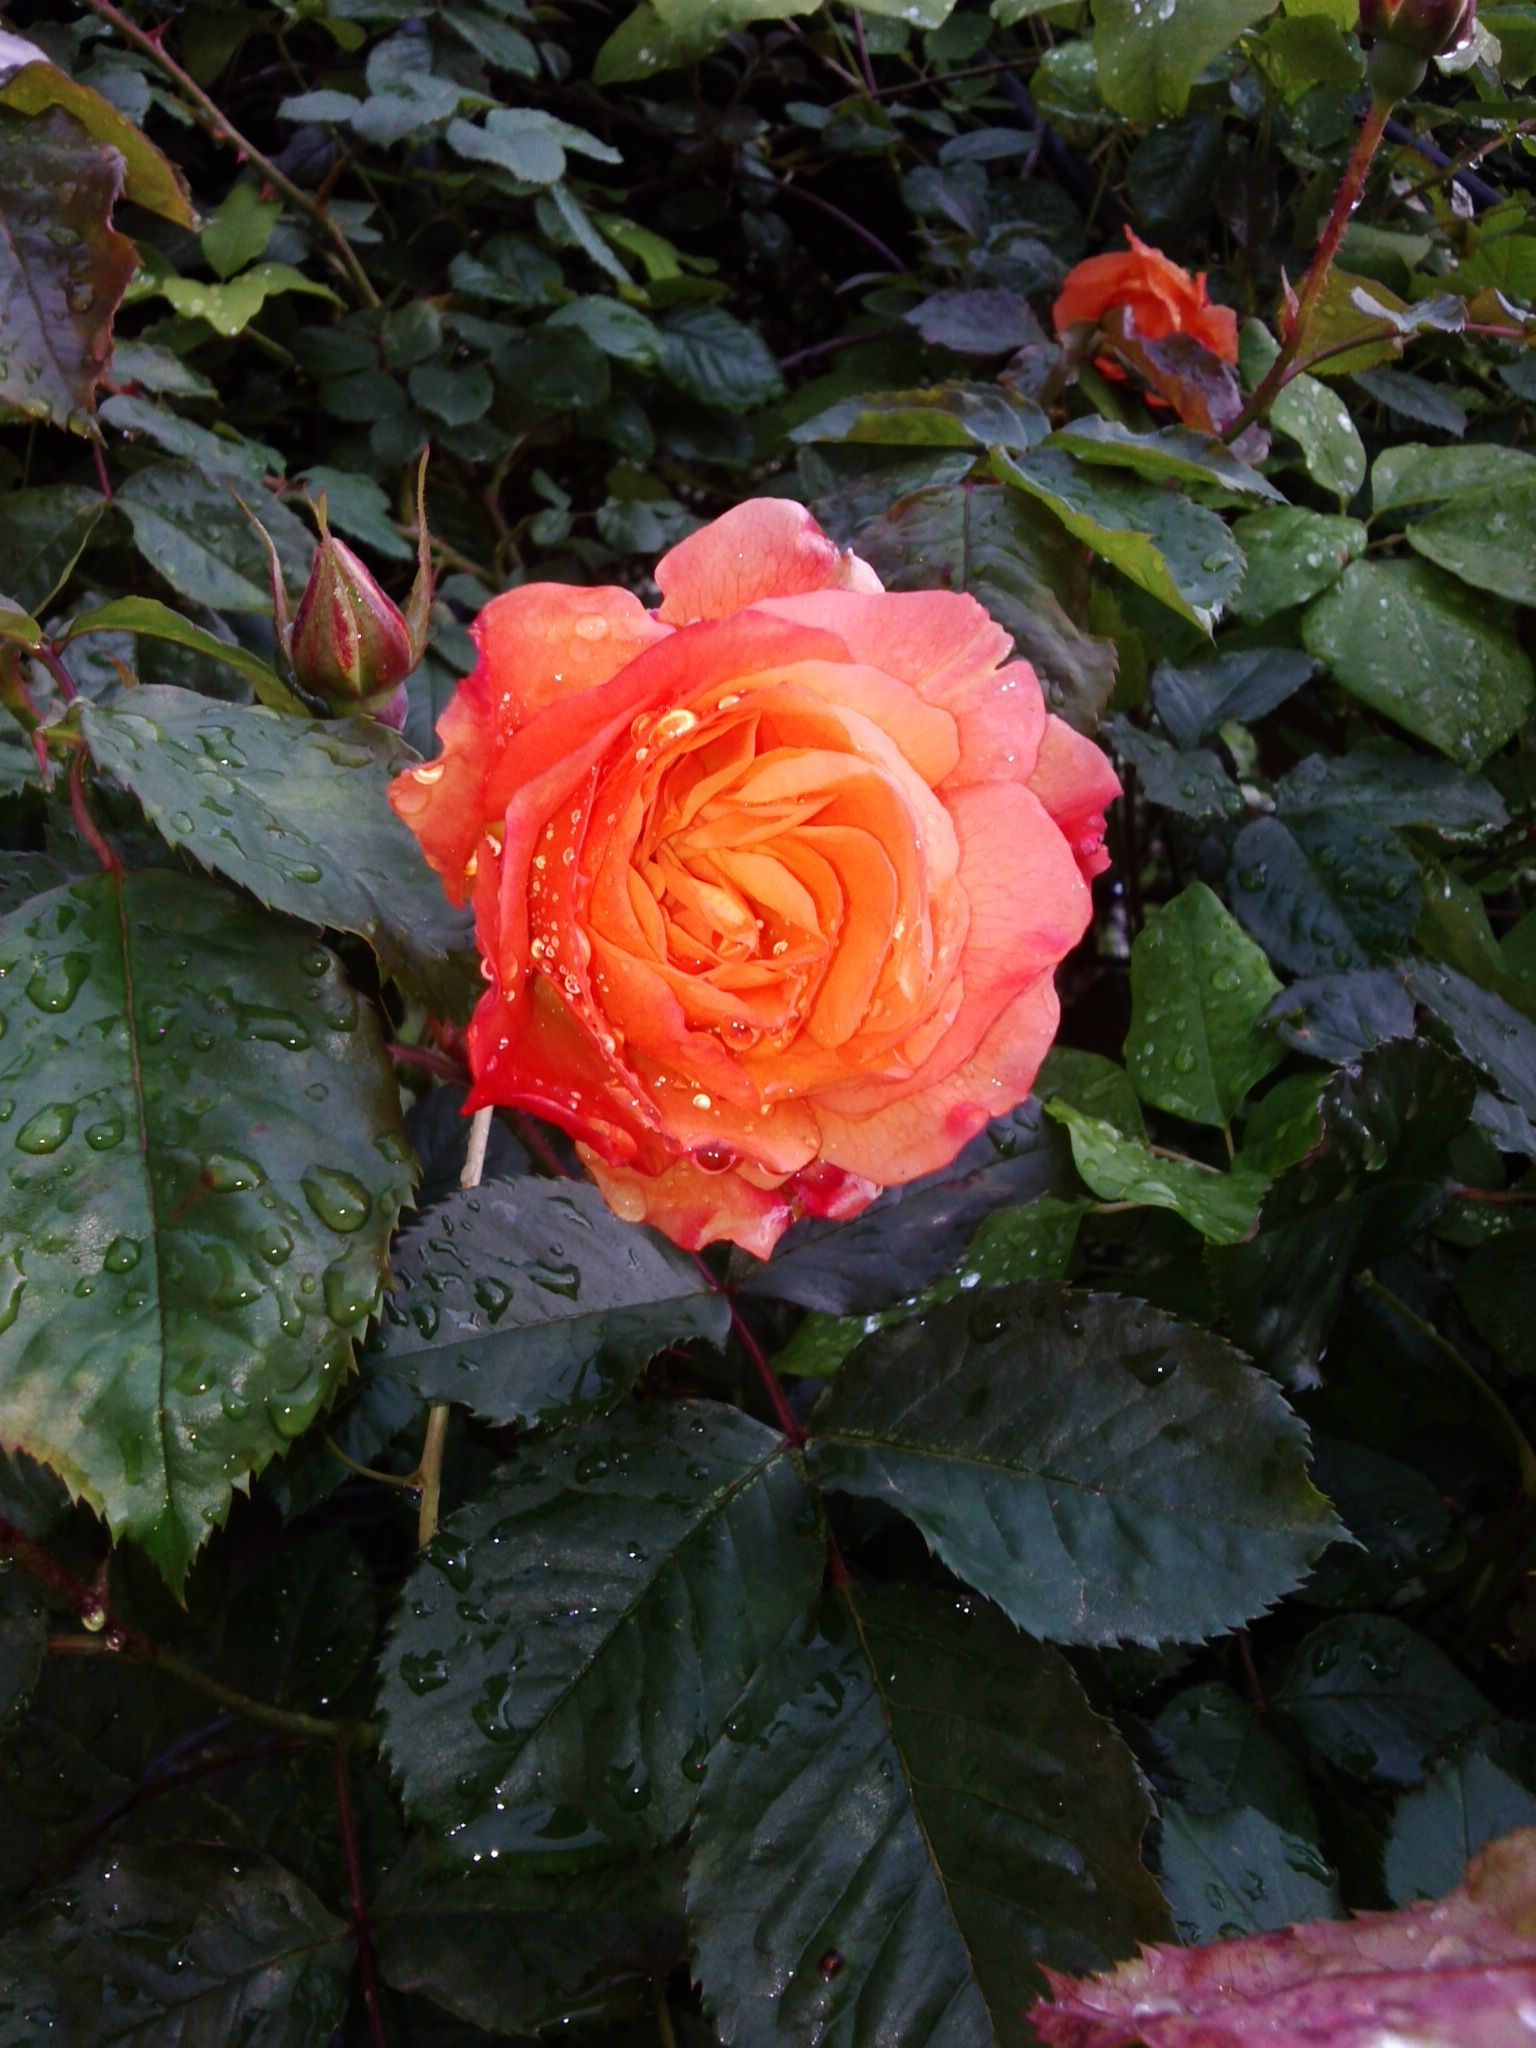 rosa Westerland,Apricot - orange.  Strong, clove, rose, spice fragrance.  20 to 30 petals. Bred by Reimer Kordes (Germany, 1969). Climber, Shrub.